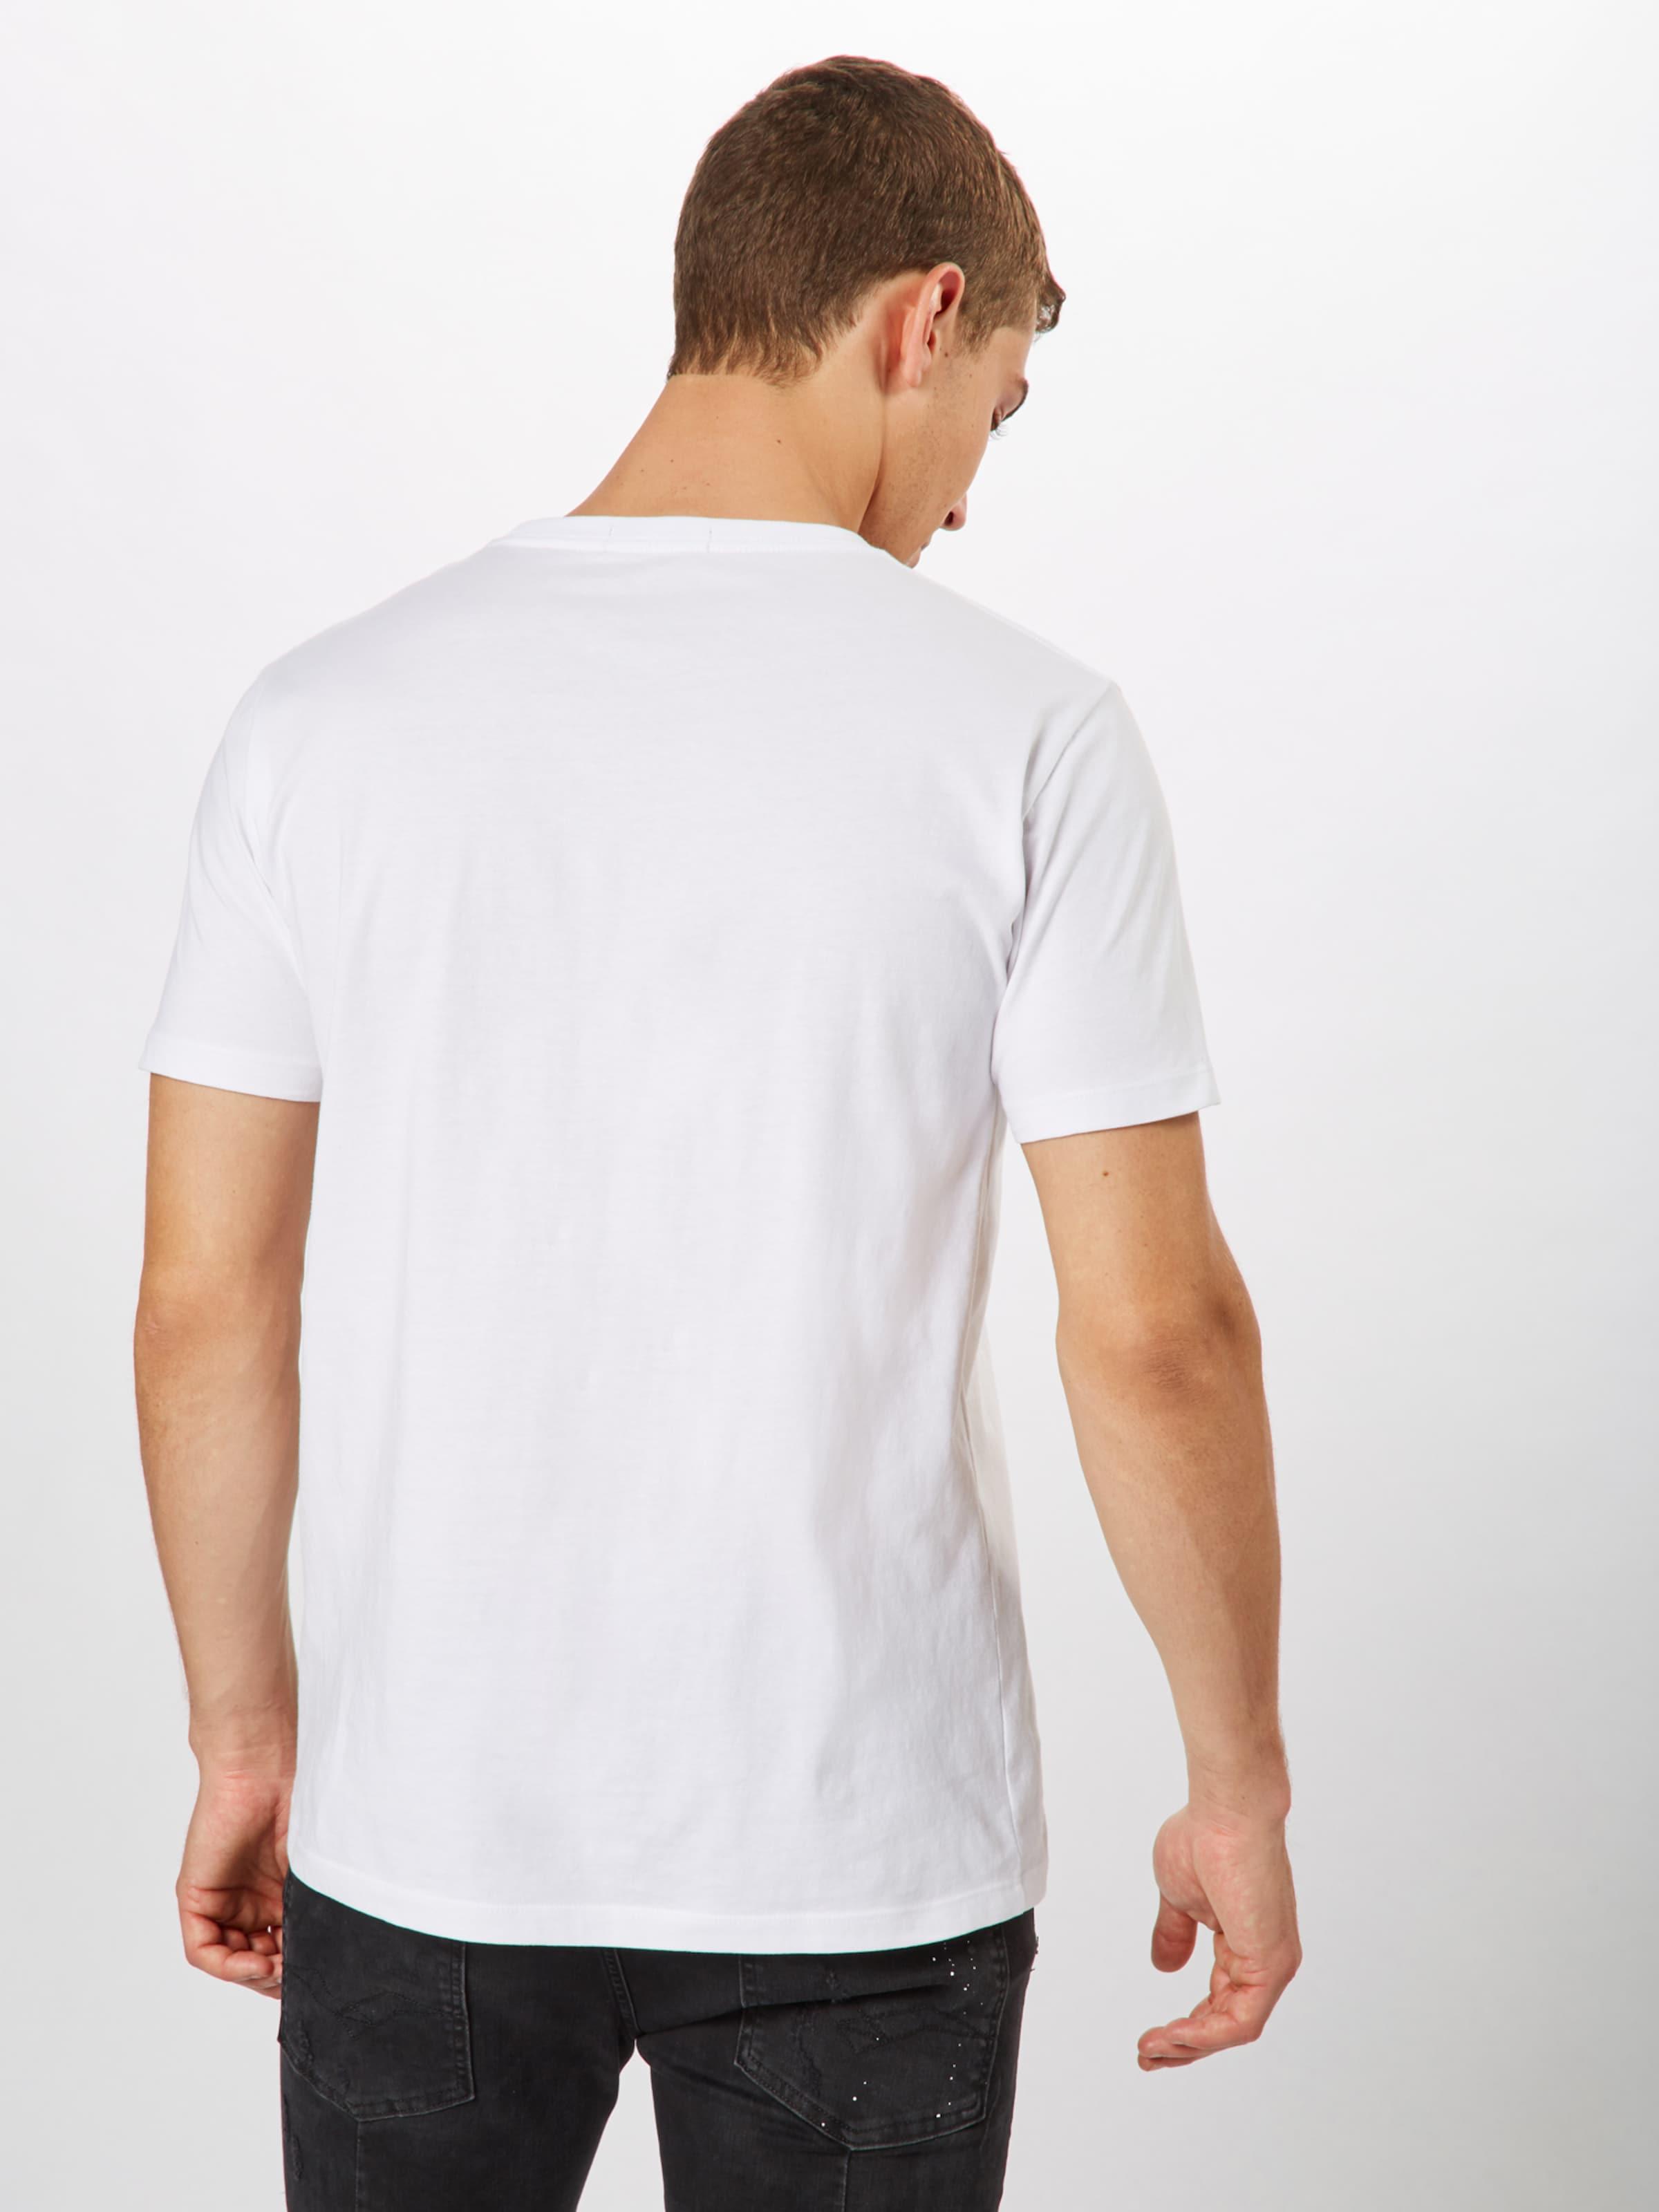 shirt T shirt Replay T Noir Replay En lF1cTKJ